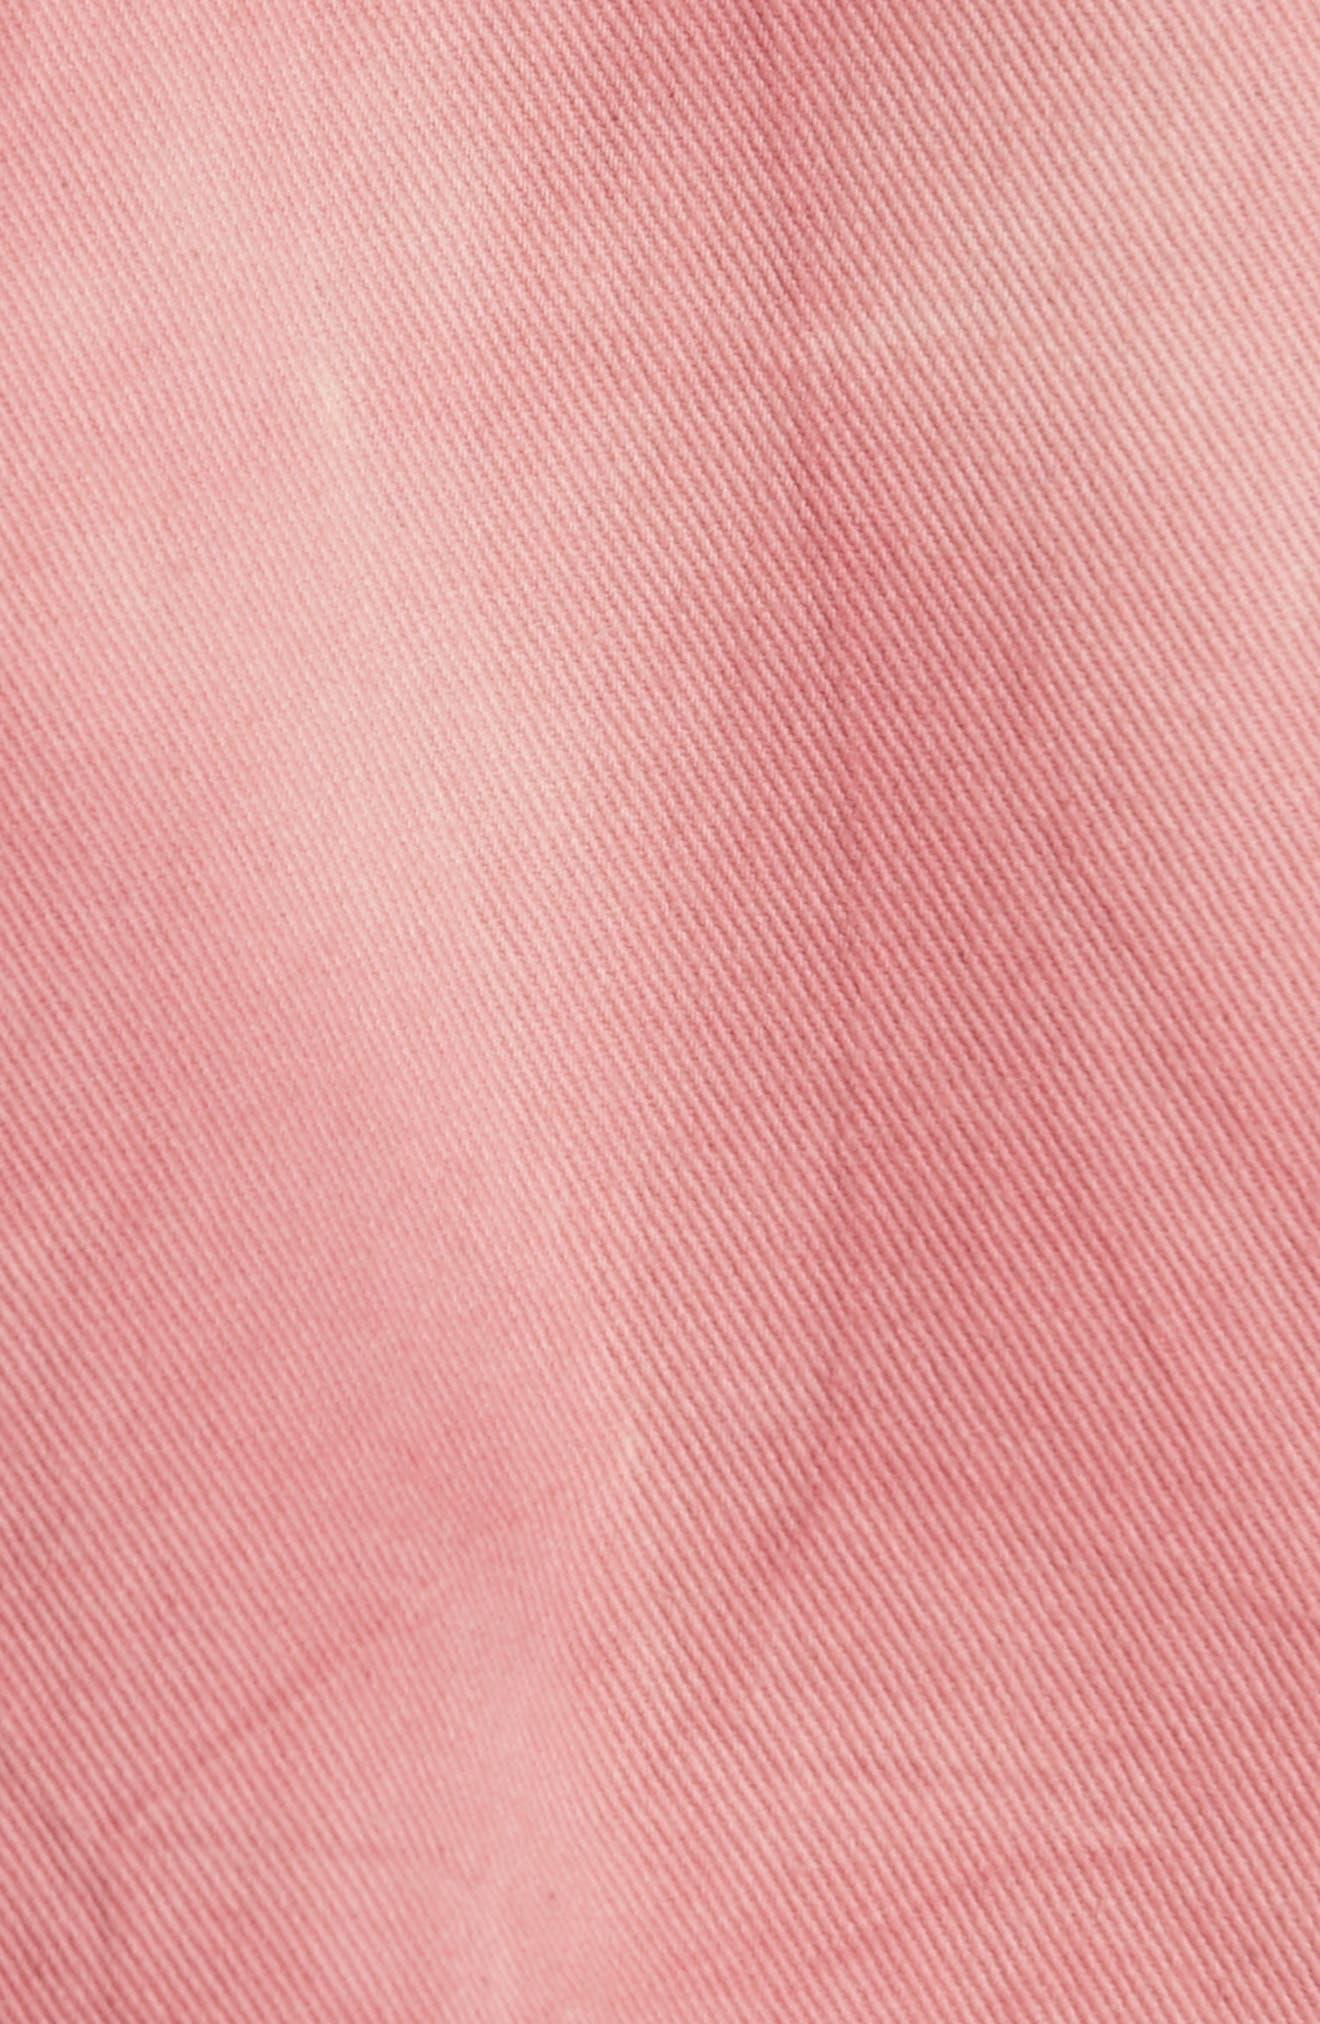 Dye Jacket,                             Alternate thumbnail 6, color,                             650